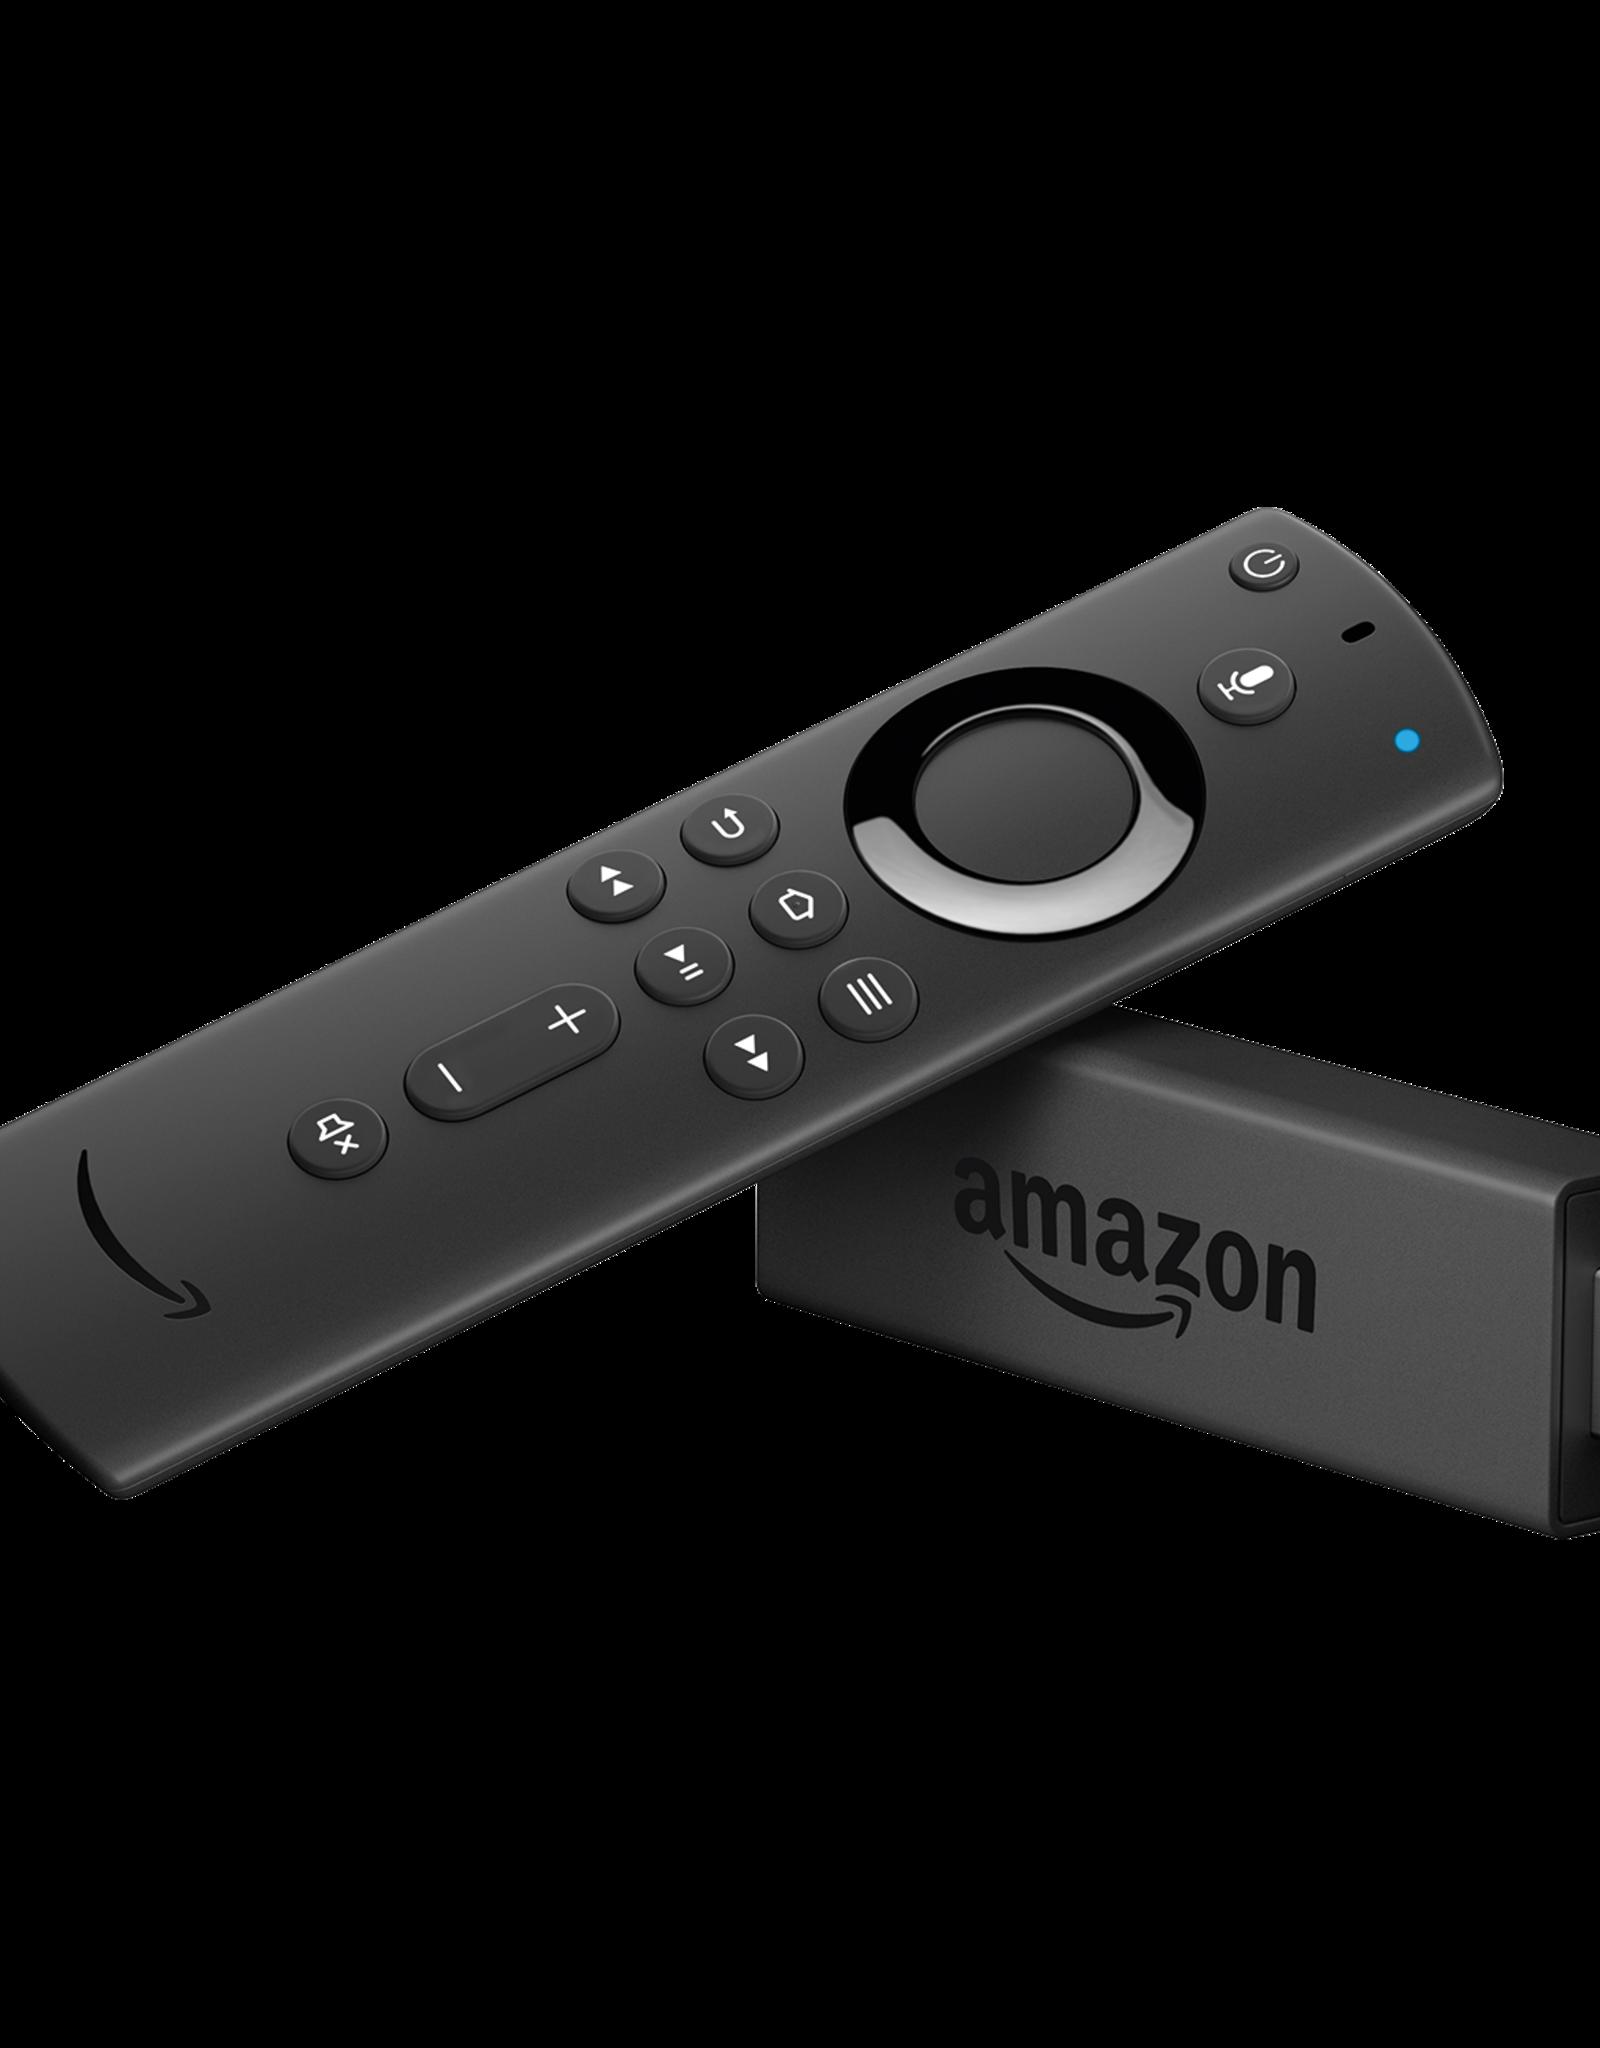 Amazon Amazon Fire TV Stick Media Streamer with Alexa Voice Remote